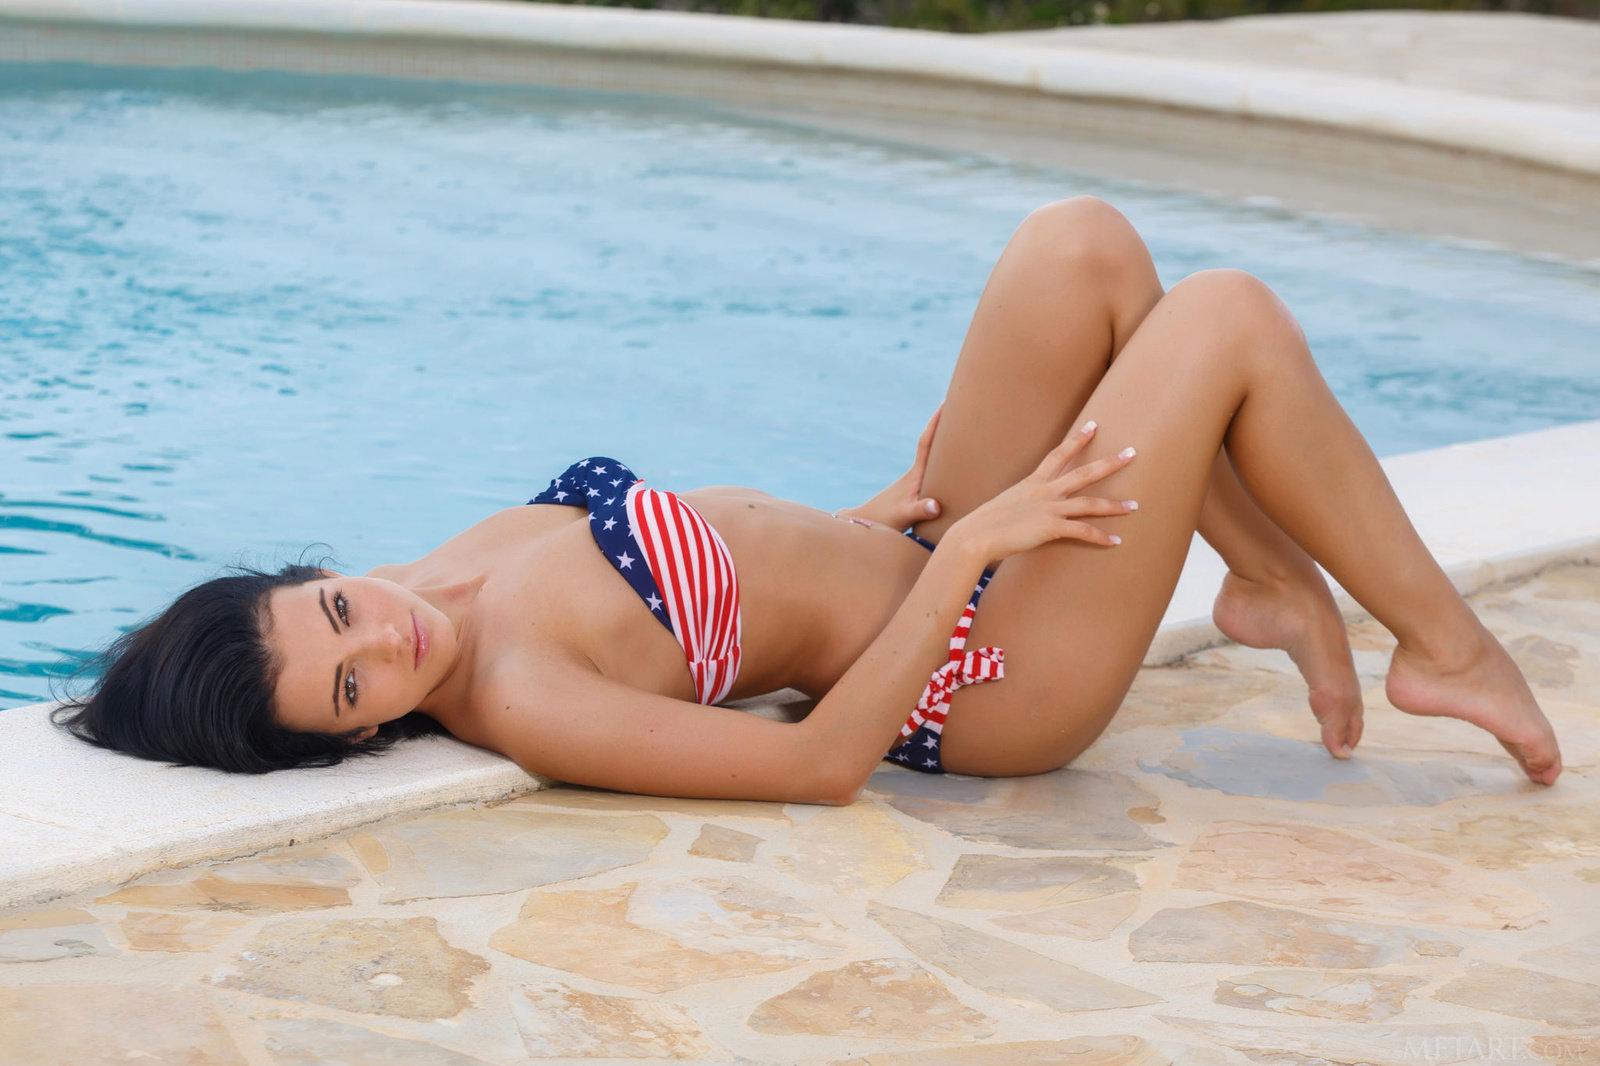 Zdjęcie porno - 08 1 - Seksowna patriotka